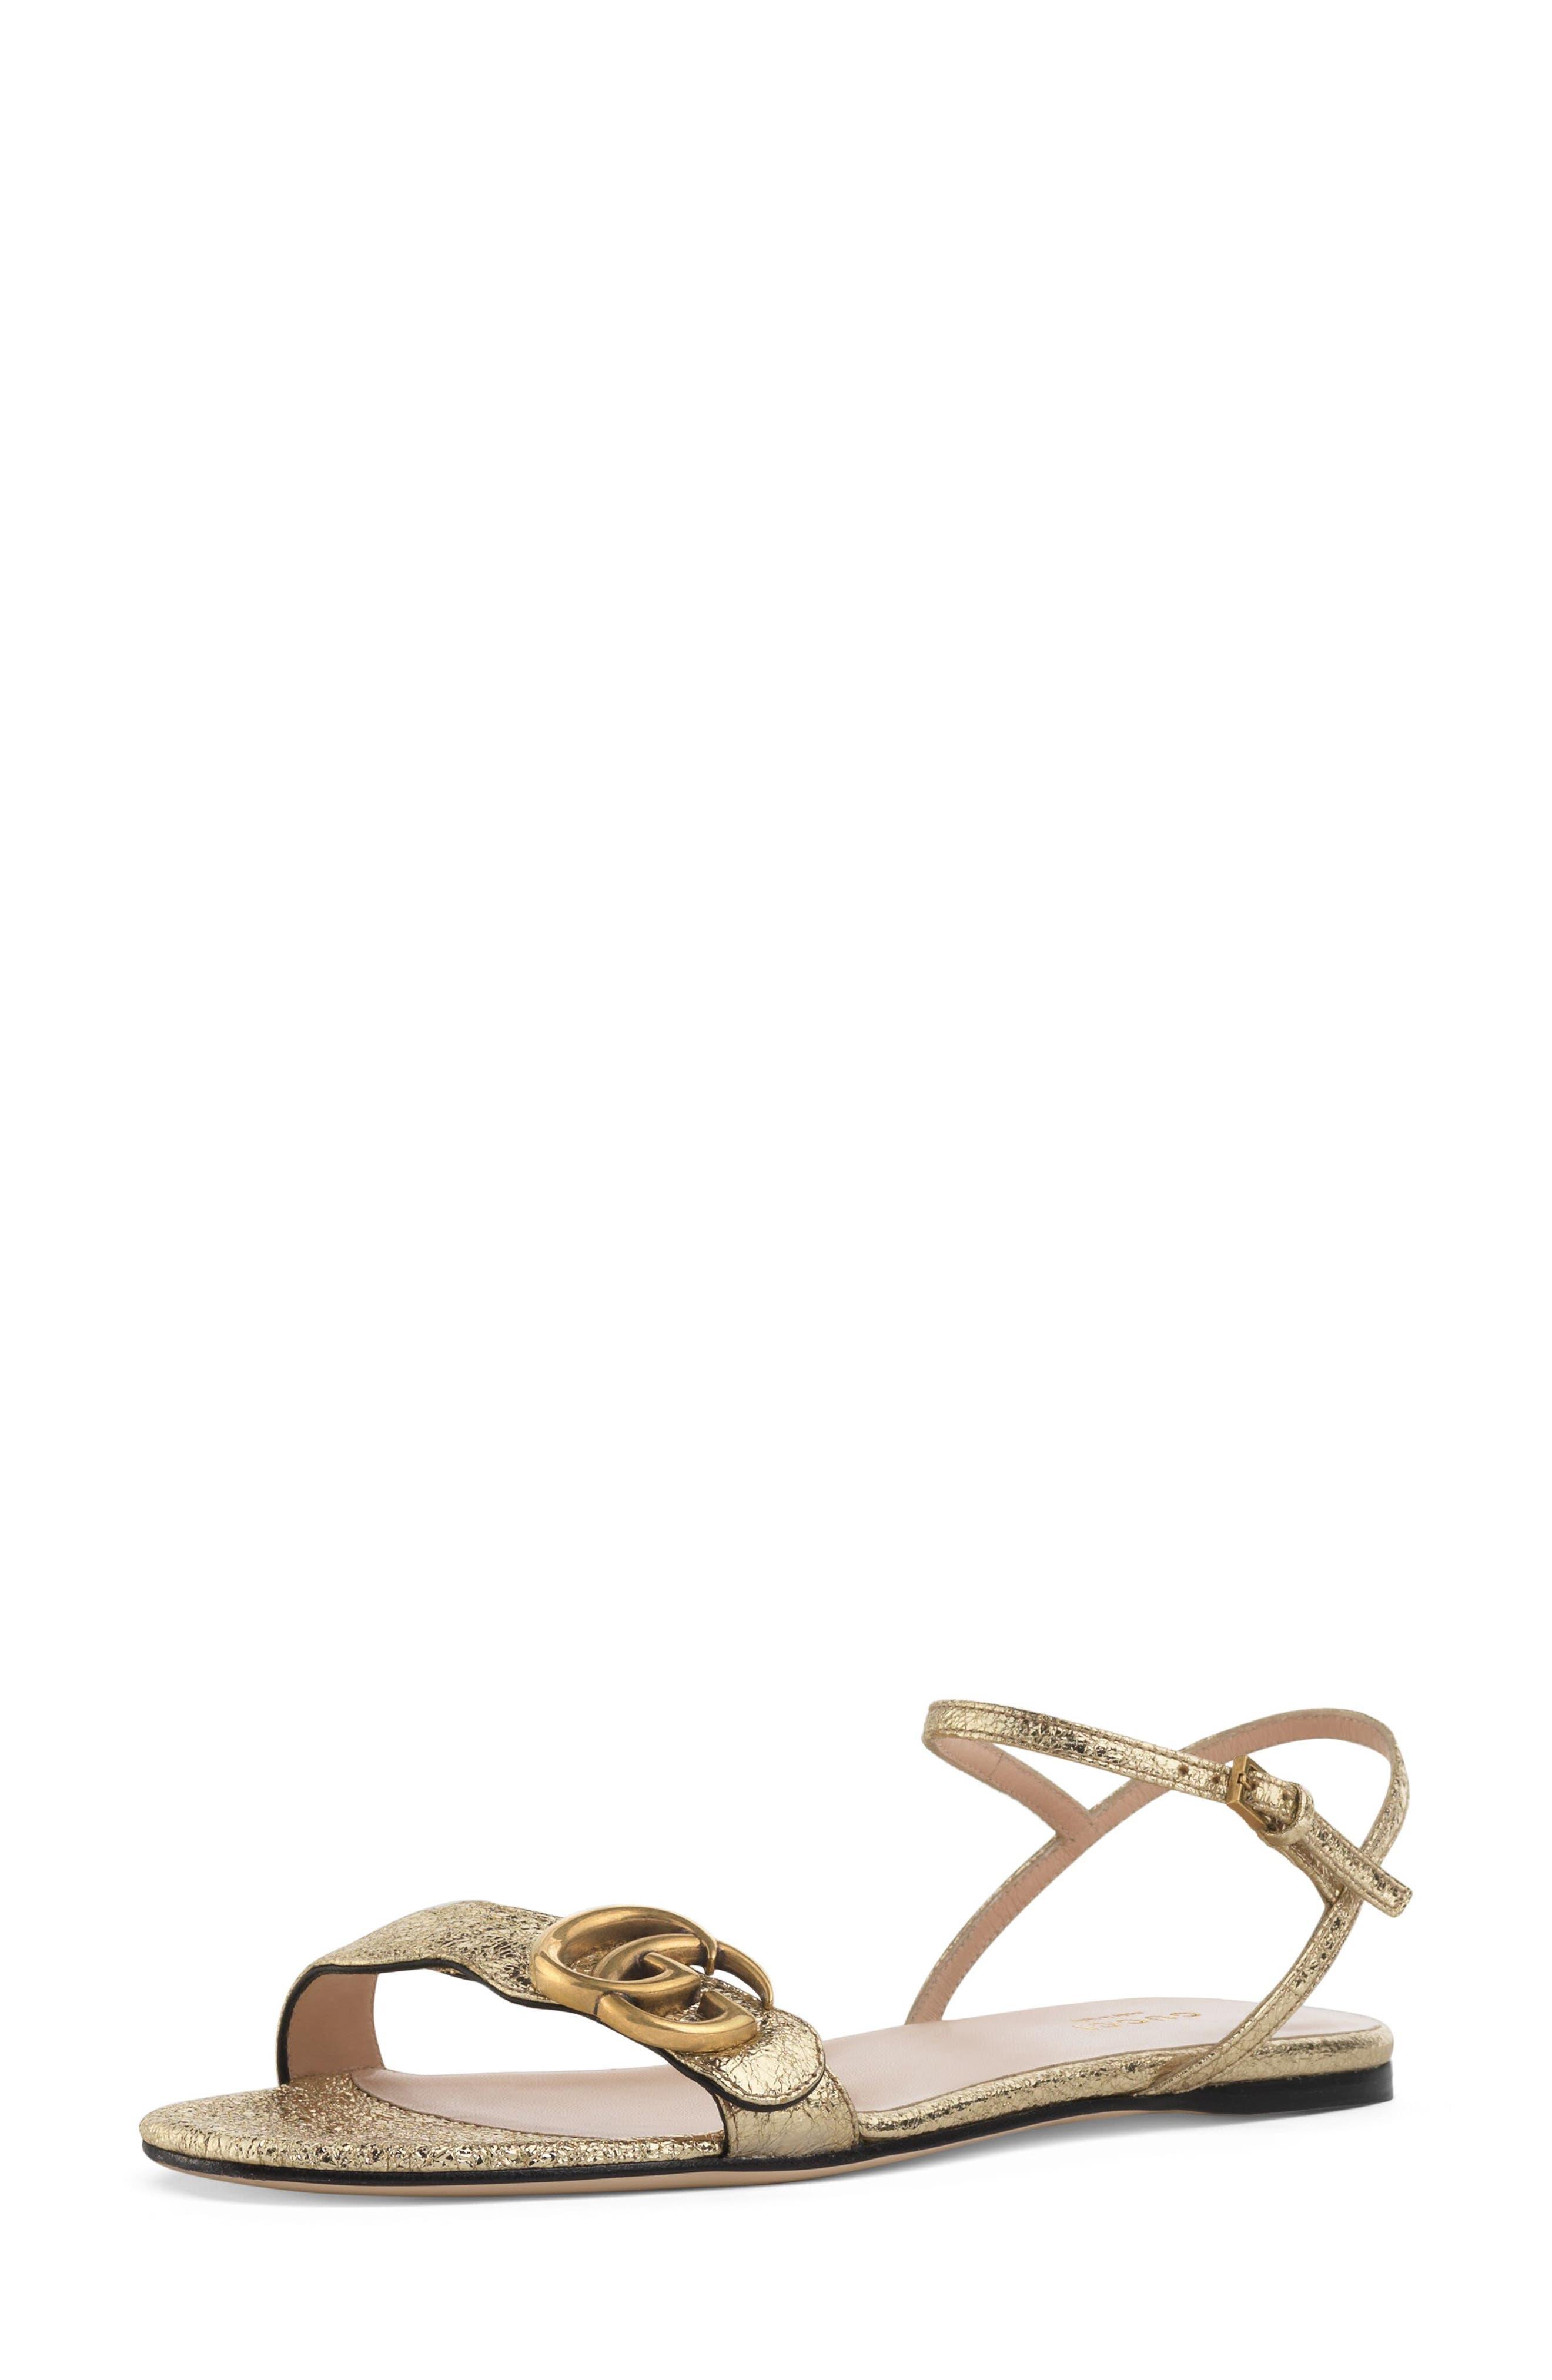 GUCCI, Marmont Quarter Strap Flat Sandal, Main thumbnail 1, color, PLATINO